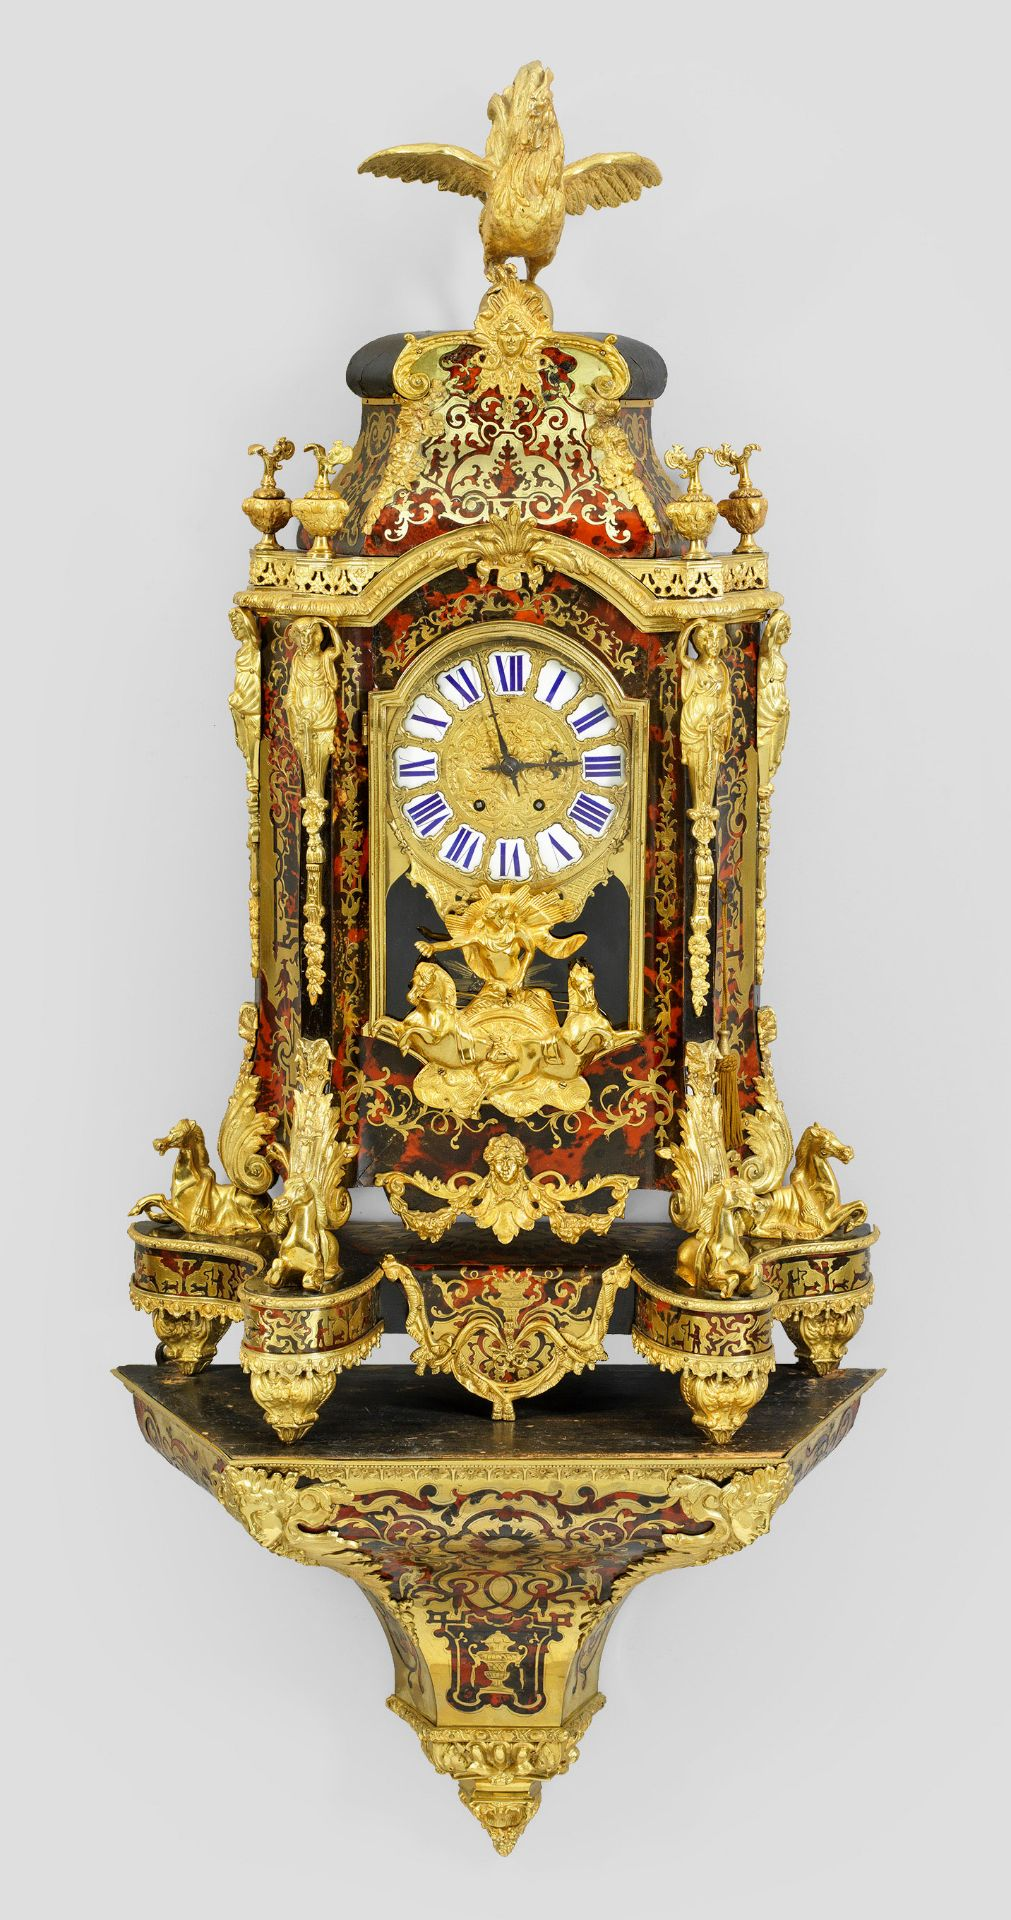 Monumentale Napoleon III Boulle-Pendule mit Konsole